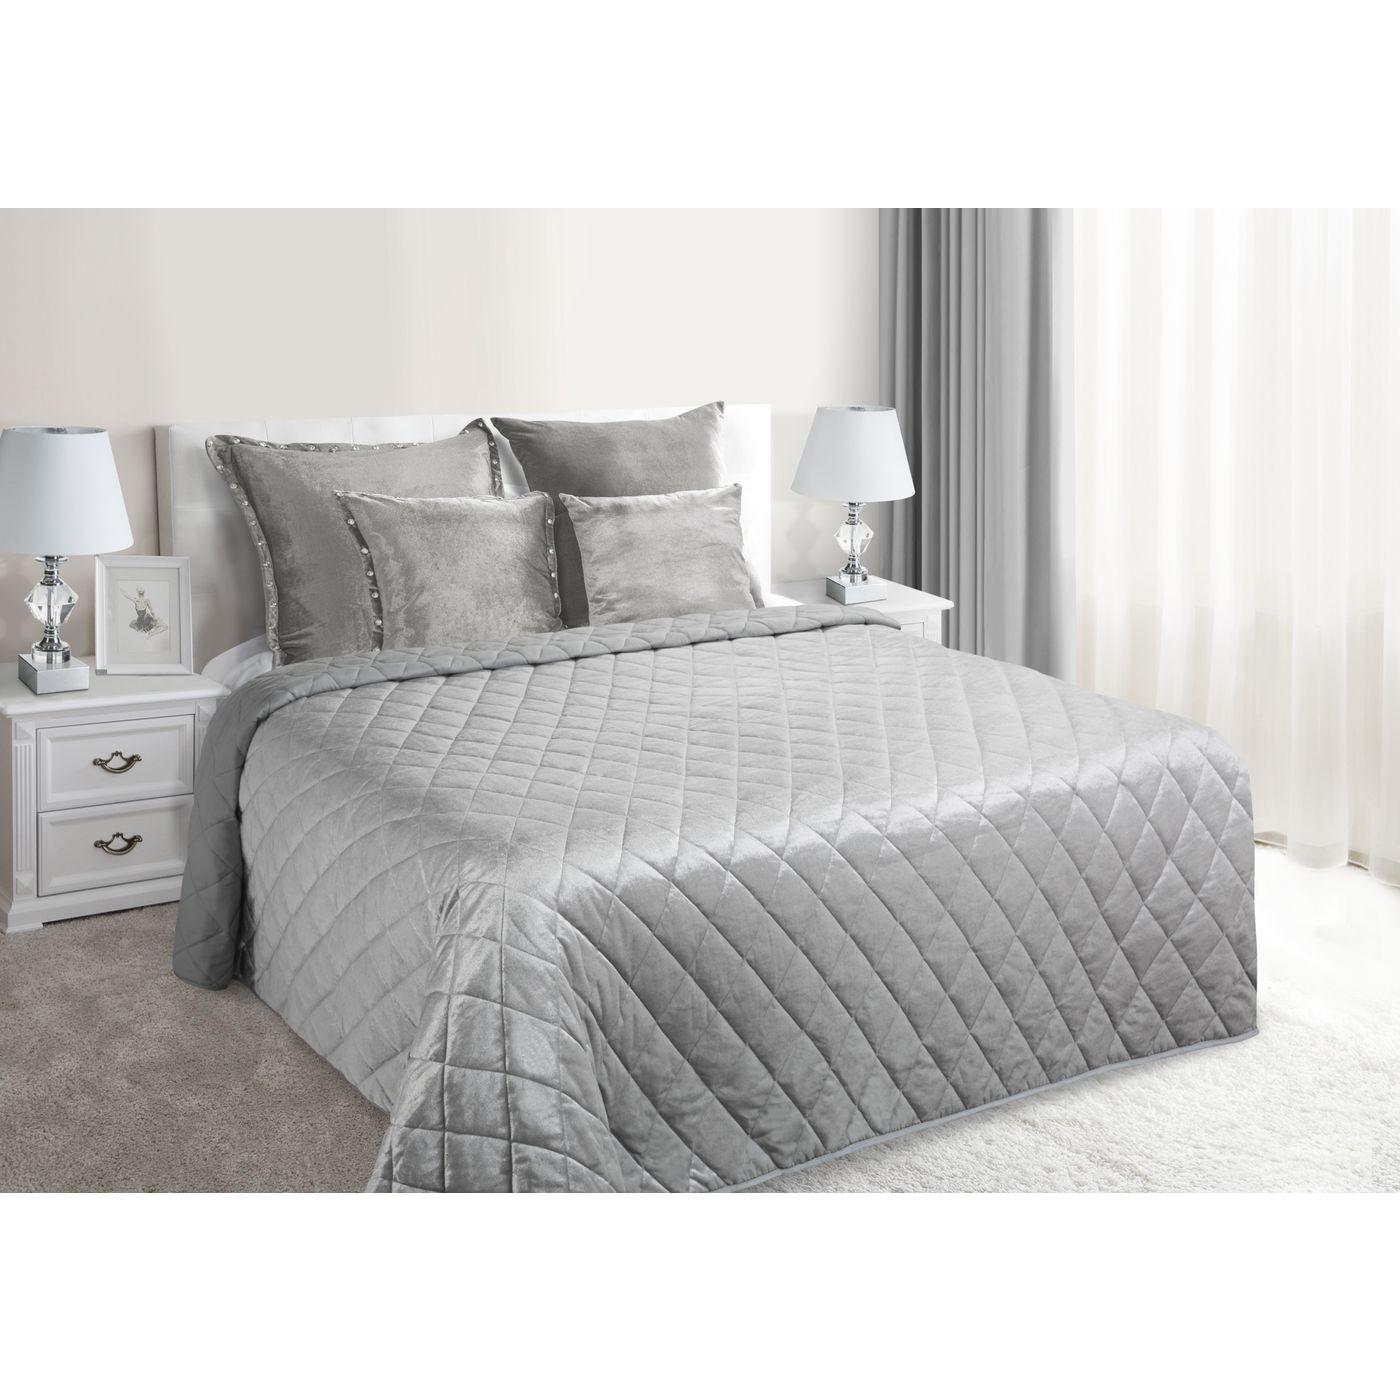 Narzuta na łóżko welwetowa pikowana 170x210 cm srebrna